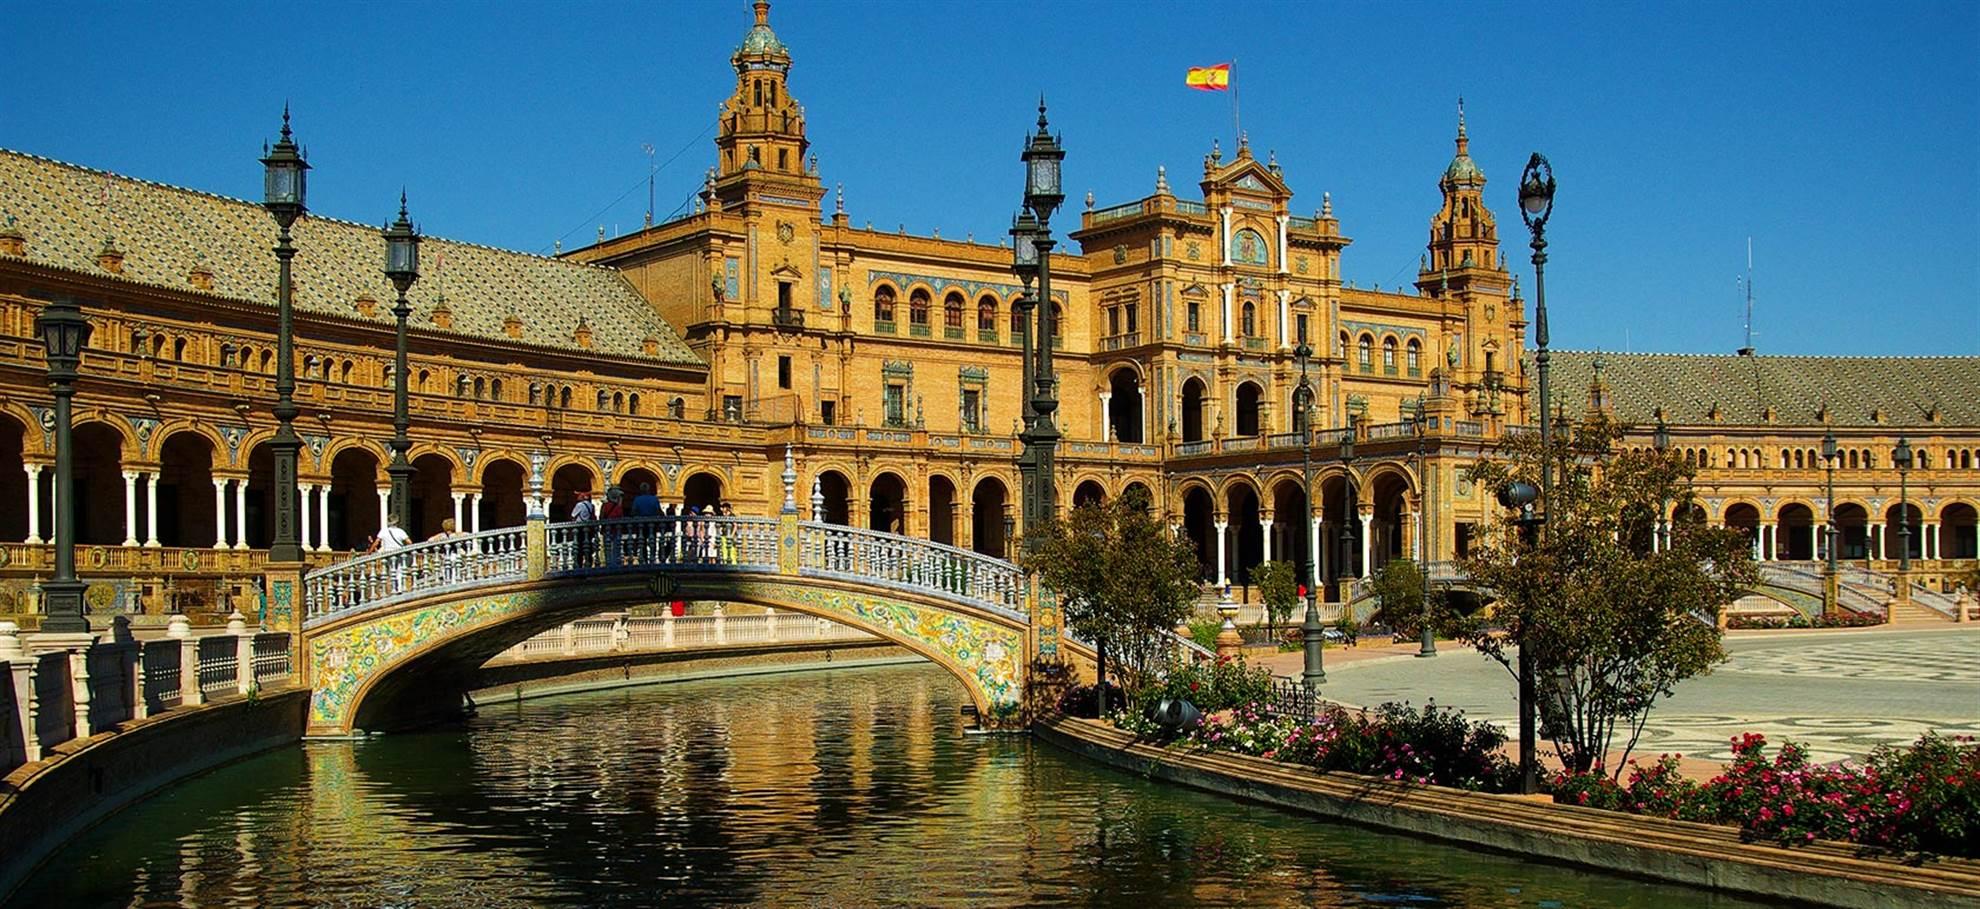 Sevilla Monumental, Visita a Pie (SVQMONUM)